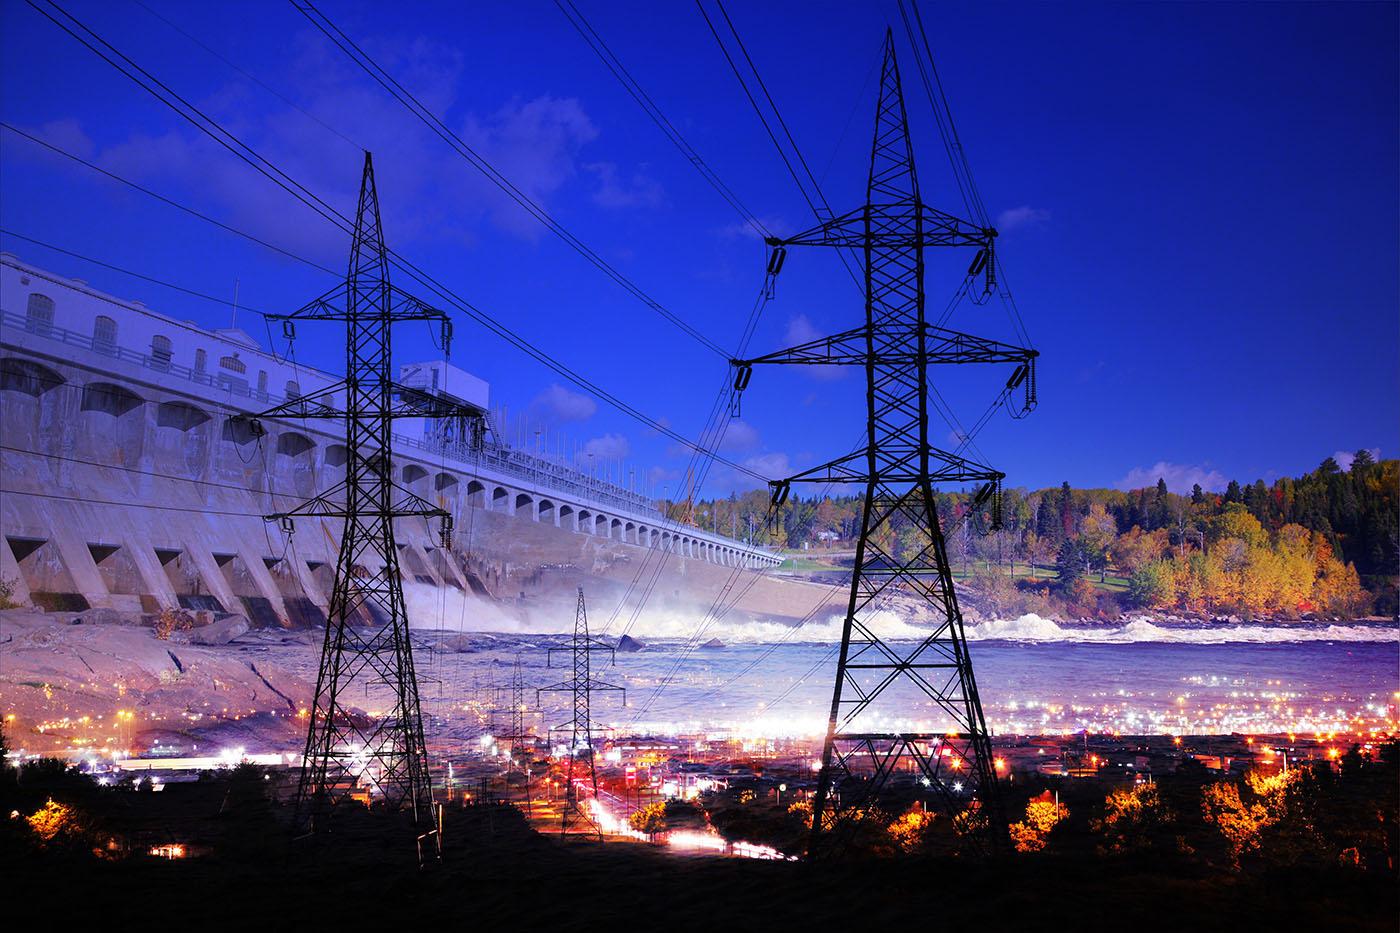 Electric Dam 01 - Stock Photo